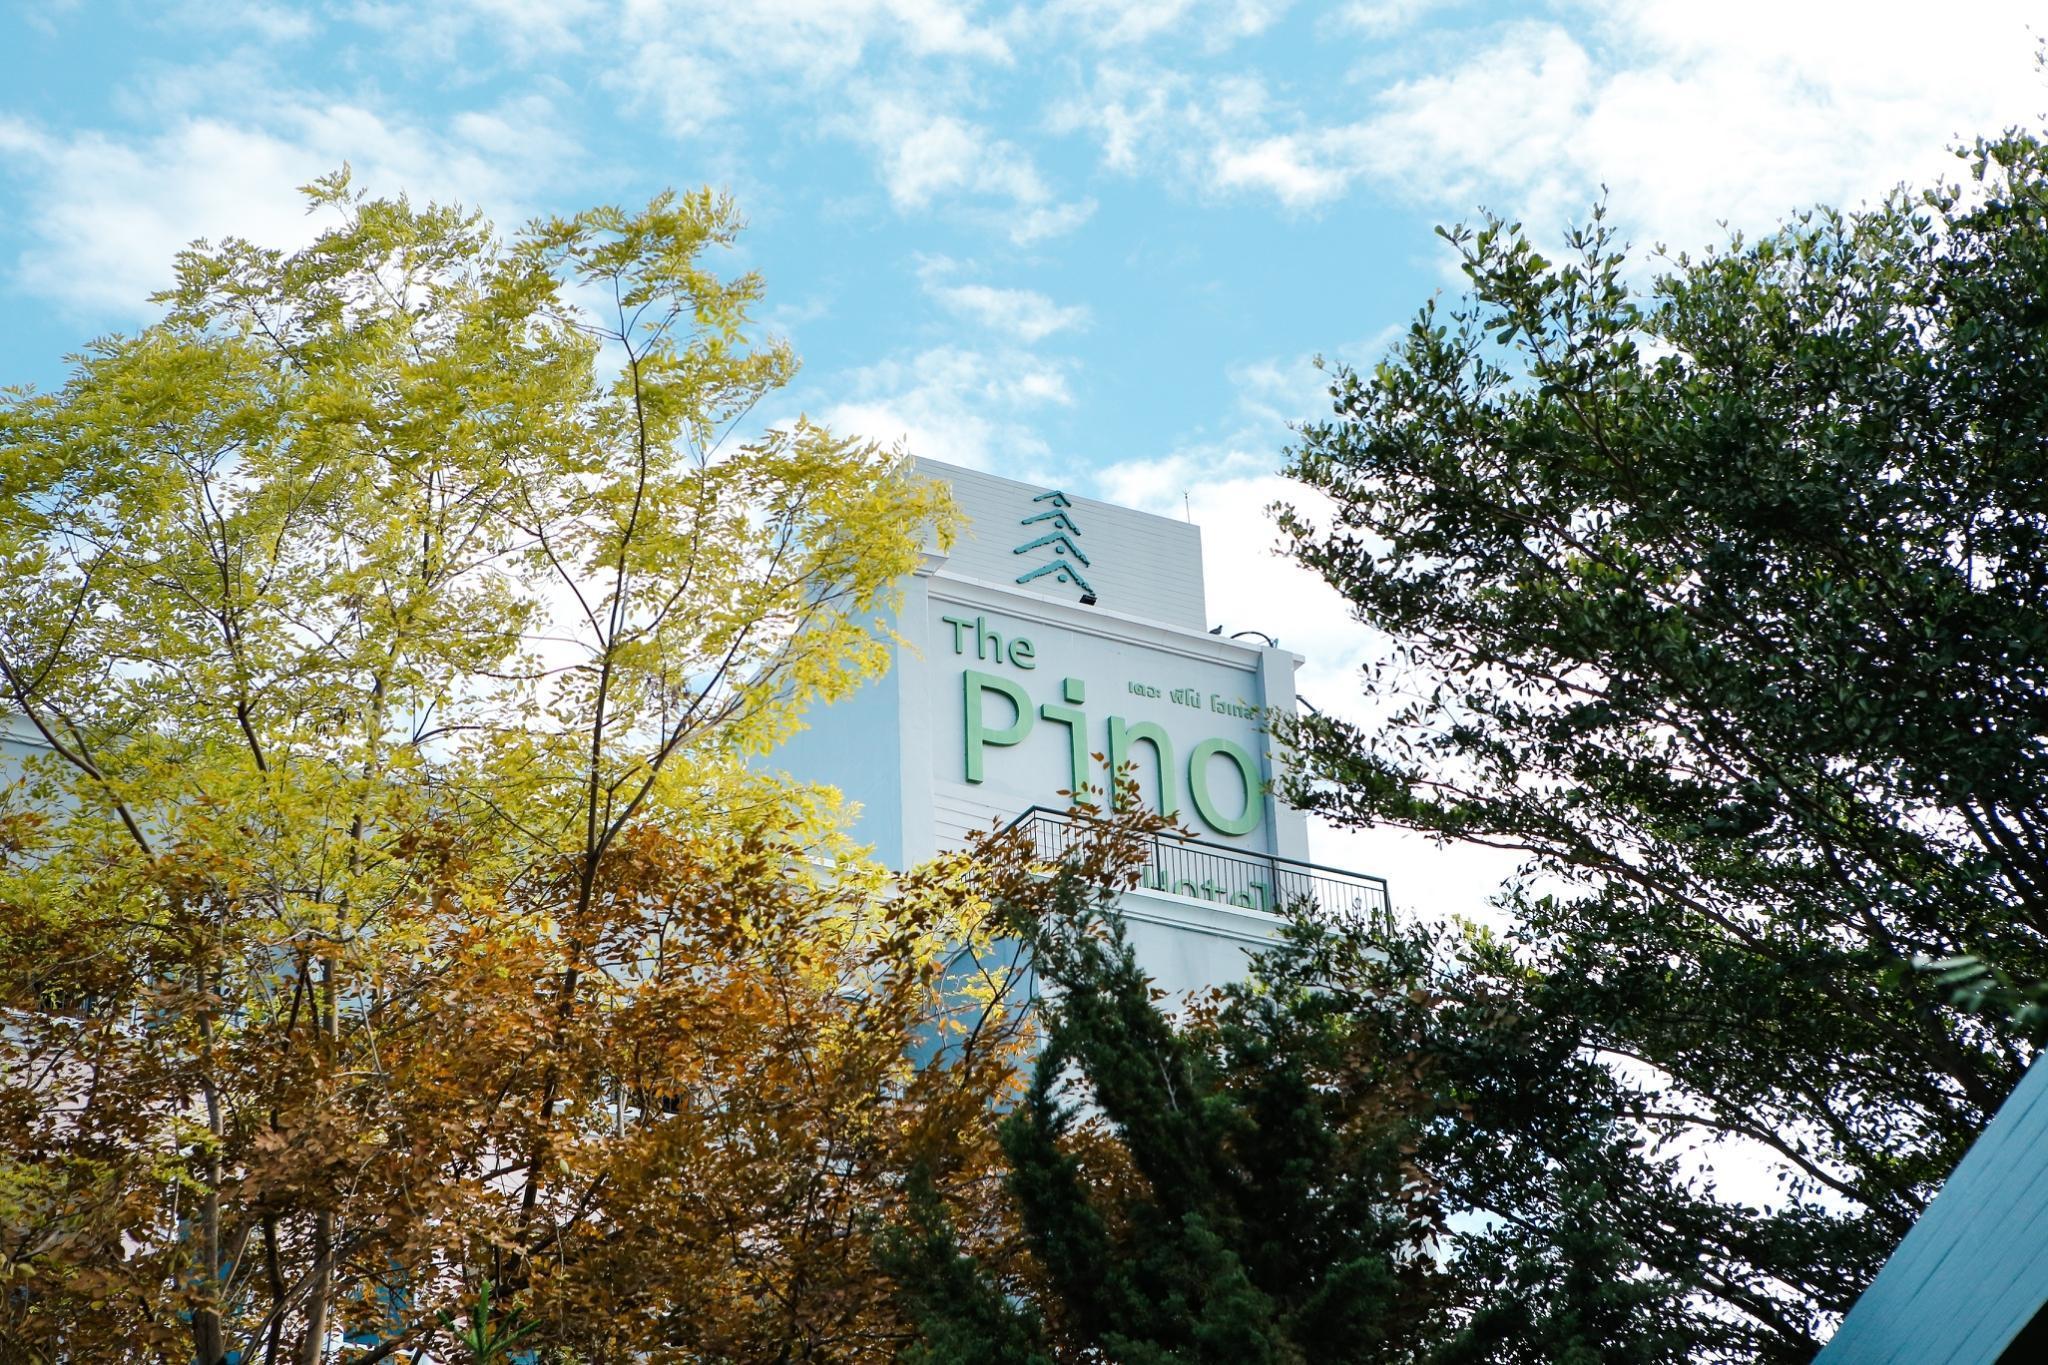 The Pino Hotel Pakchong เดอะ พีโน่ โฮเทล ปากช่อง